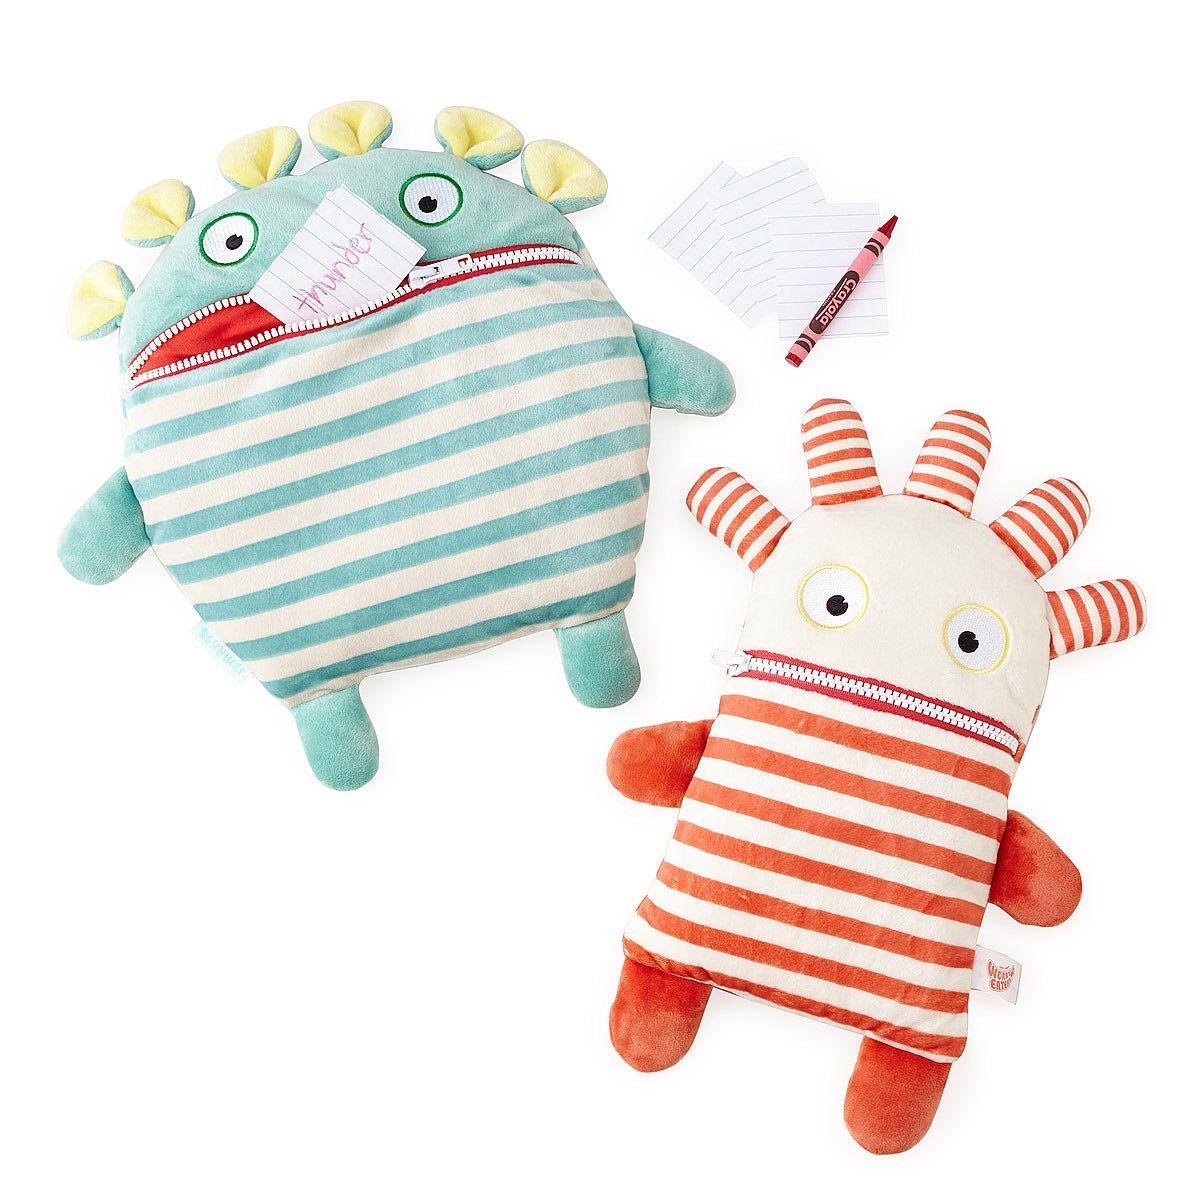 Worry Eating Plush Pals stuffed animals, stress aid